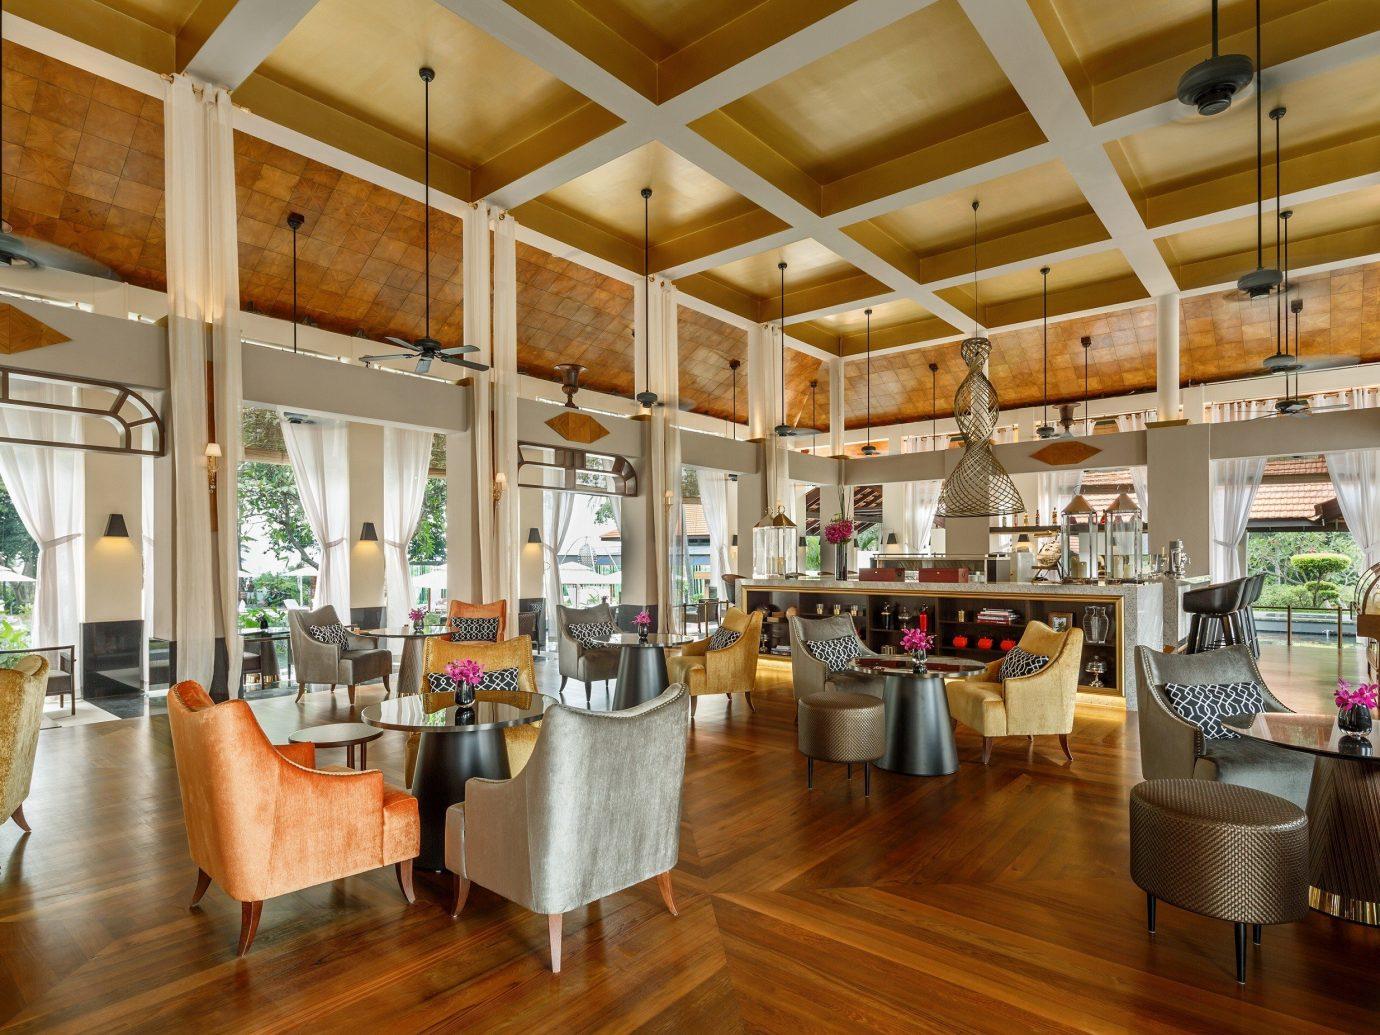 Hotels indoor floor room ceiling property window Living estate interior design restaurant home real estate Resort Lobby area wood Design furniture